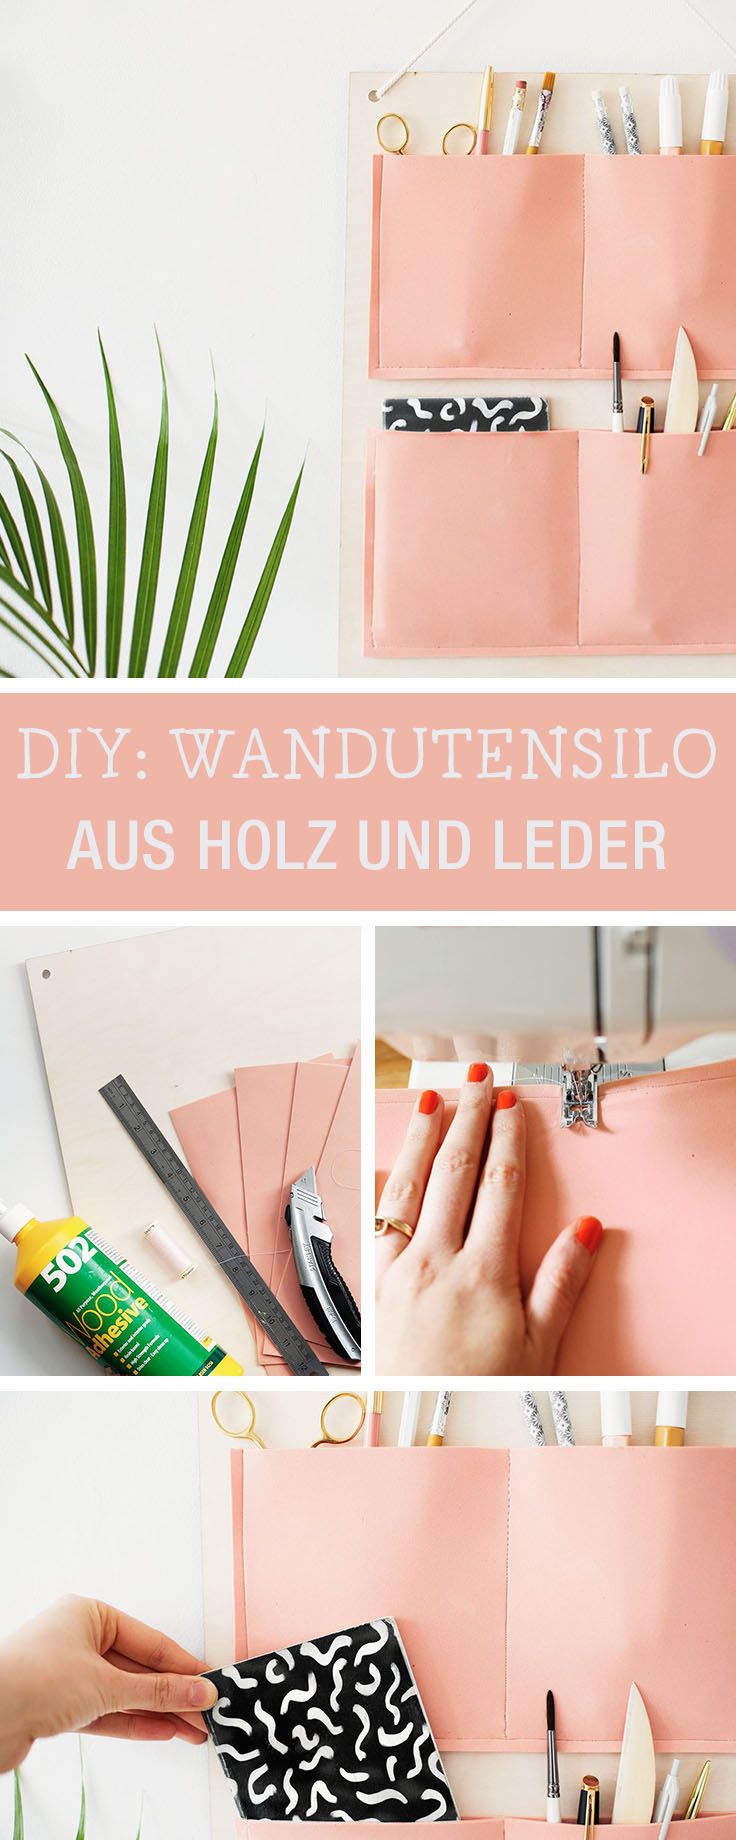 DIY-Anleitung: Wandutensilo aus Holz und Leder machen via DaWanda ...